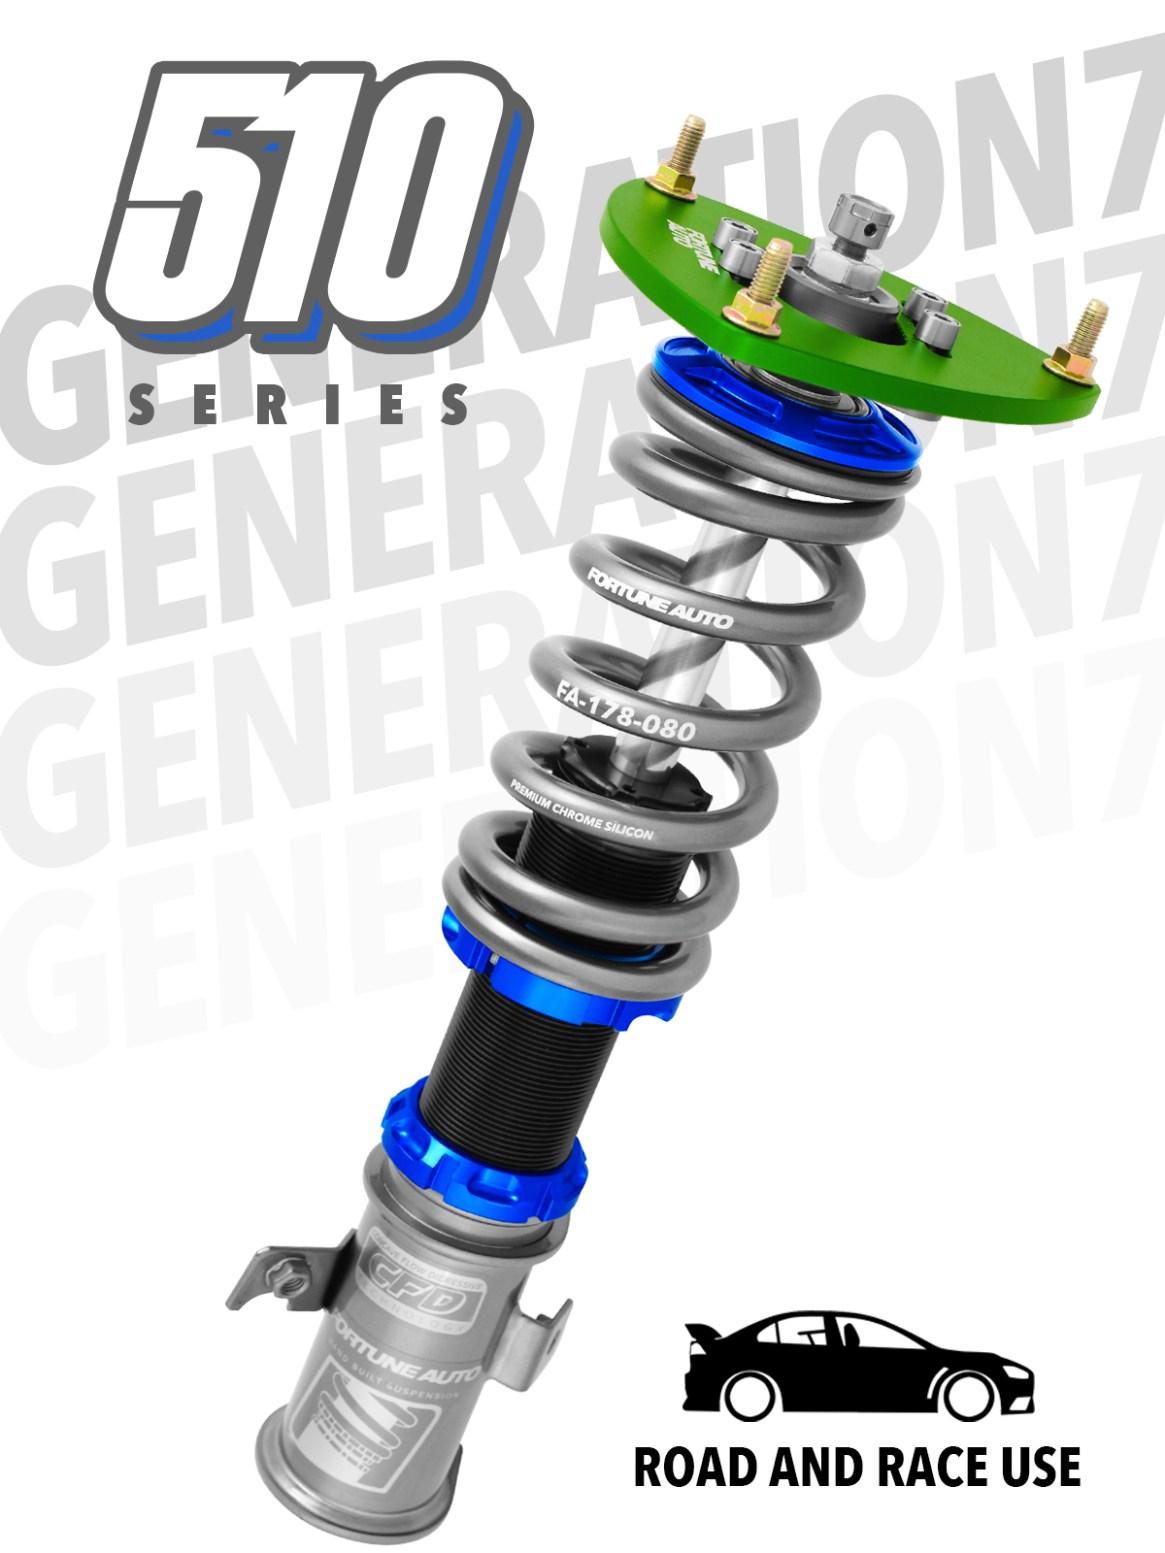 510 Series Generation 7